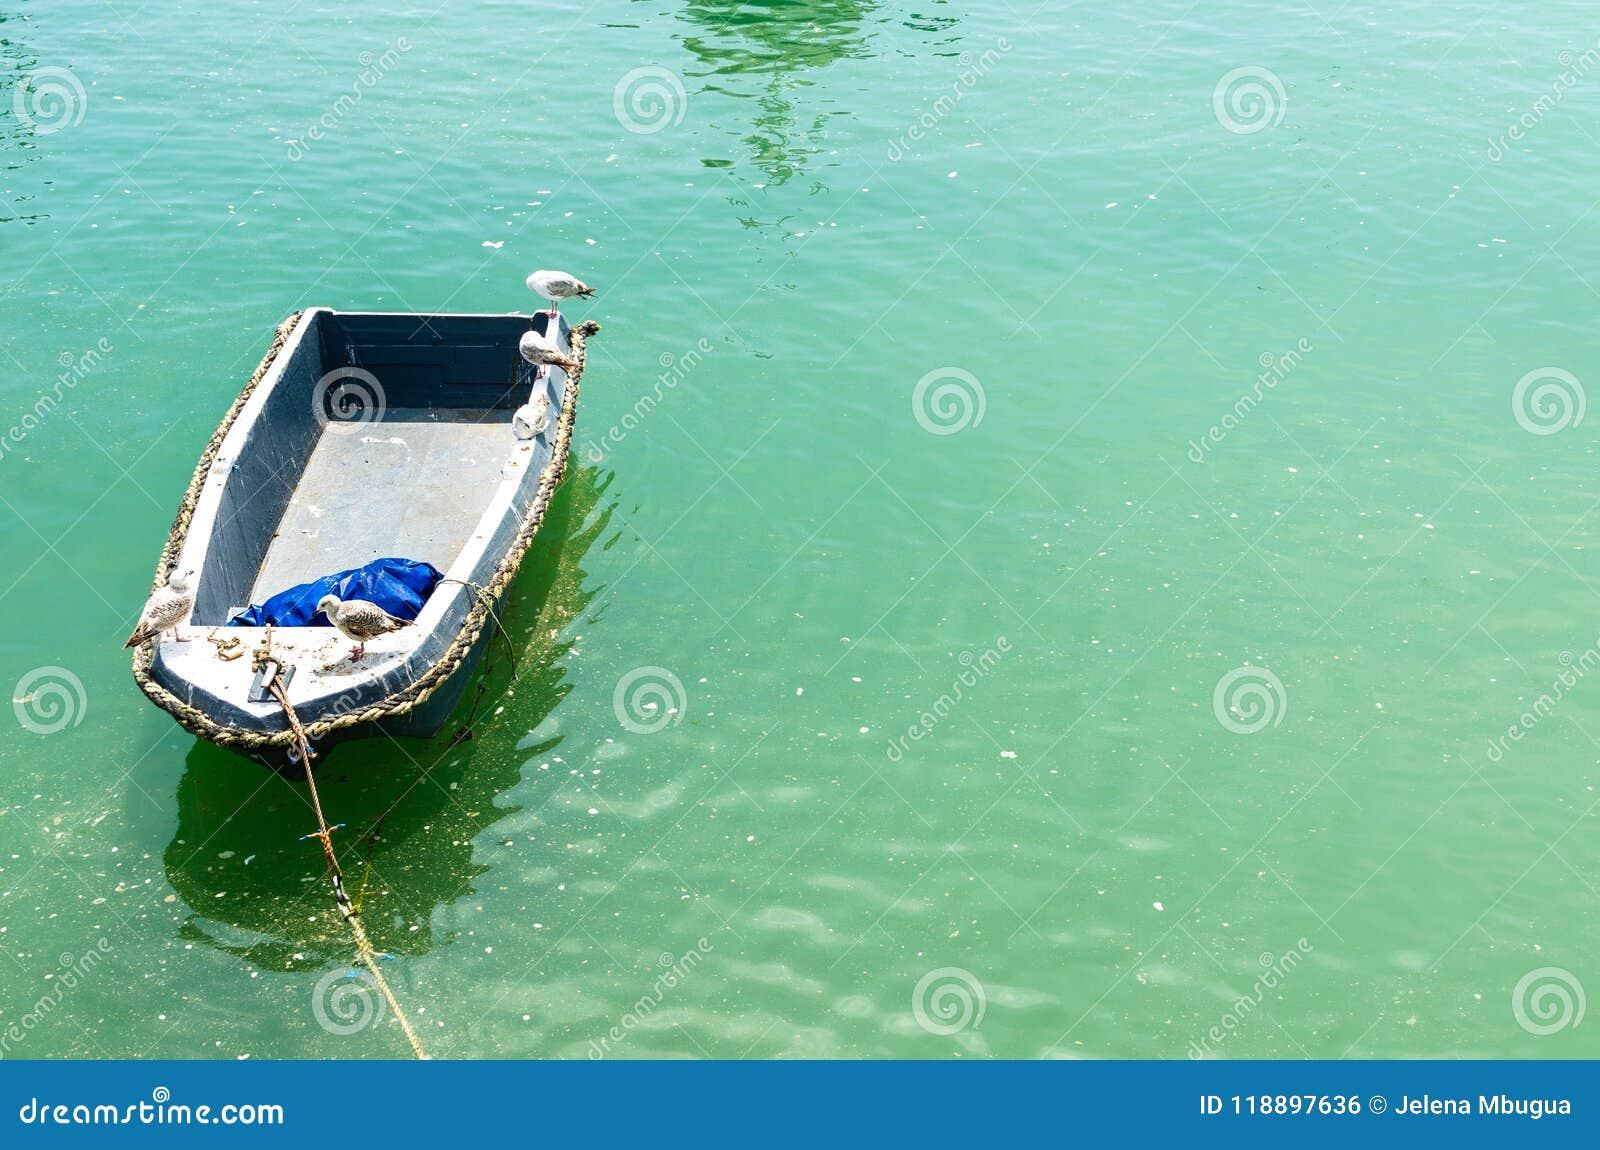 Seagulls σε ένα κενό ξύλινο αλιευτικό σκάφος στα τυρκουάζ νερά